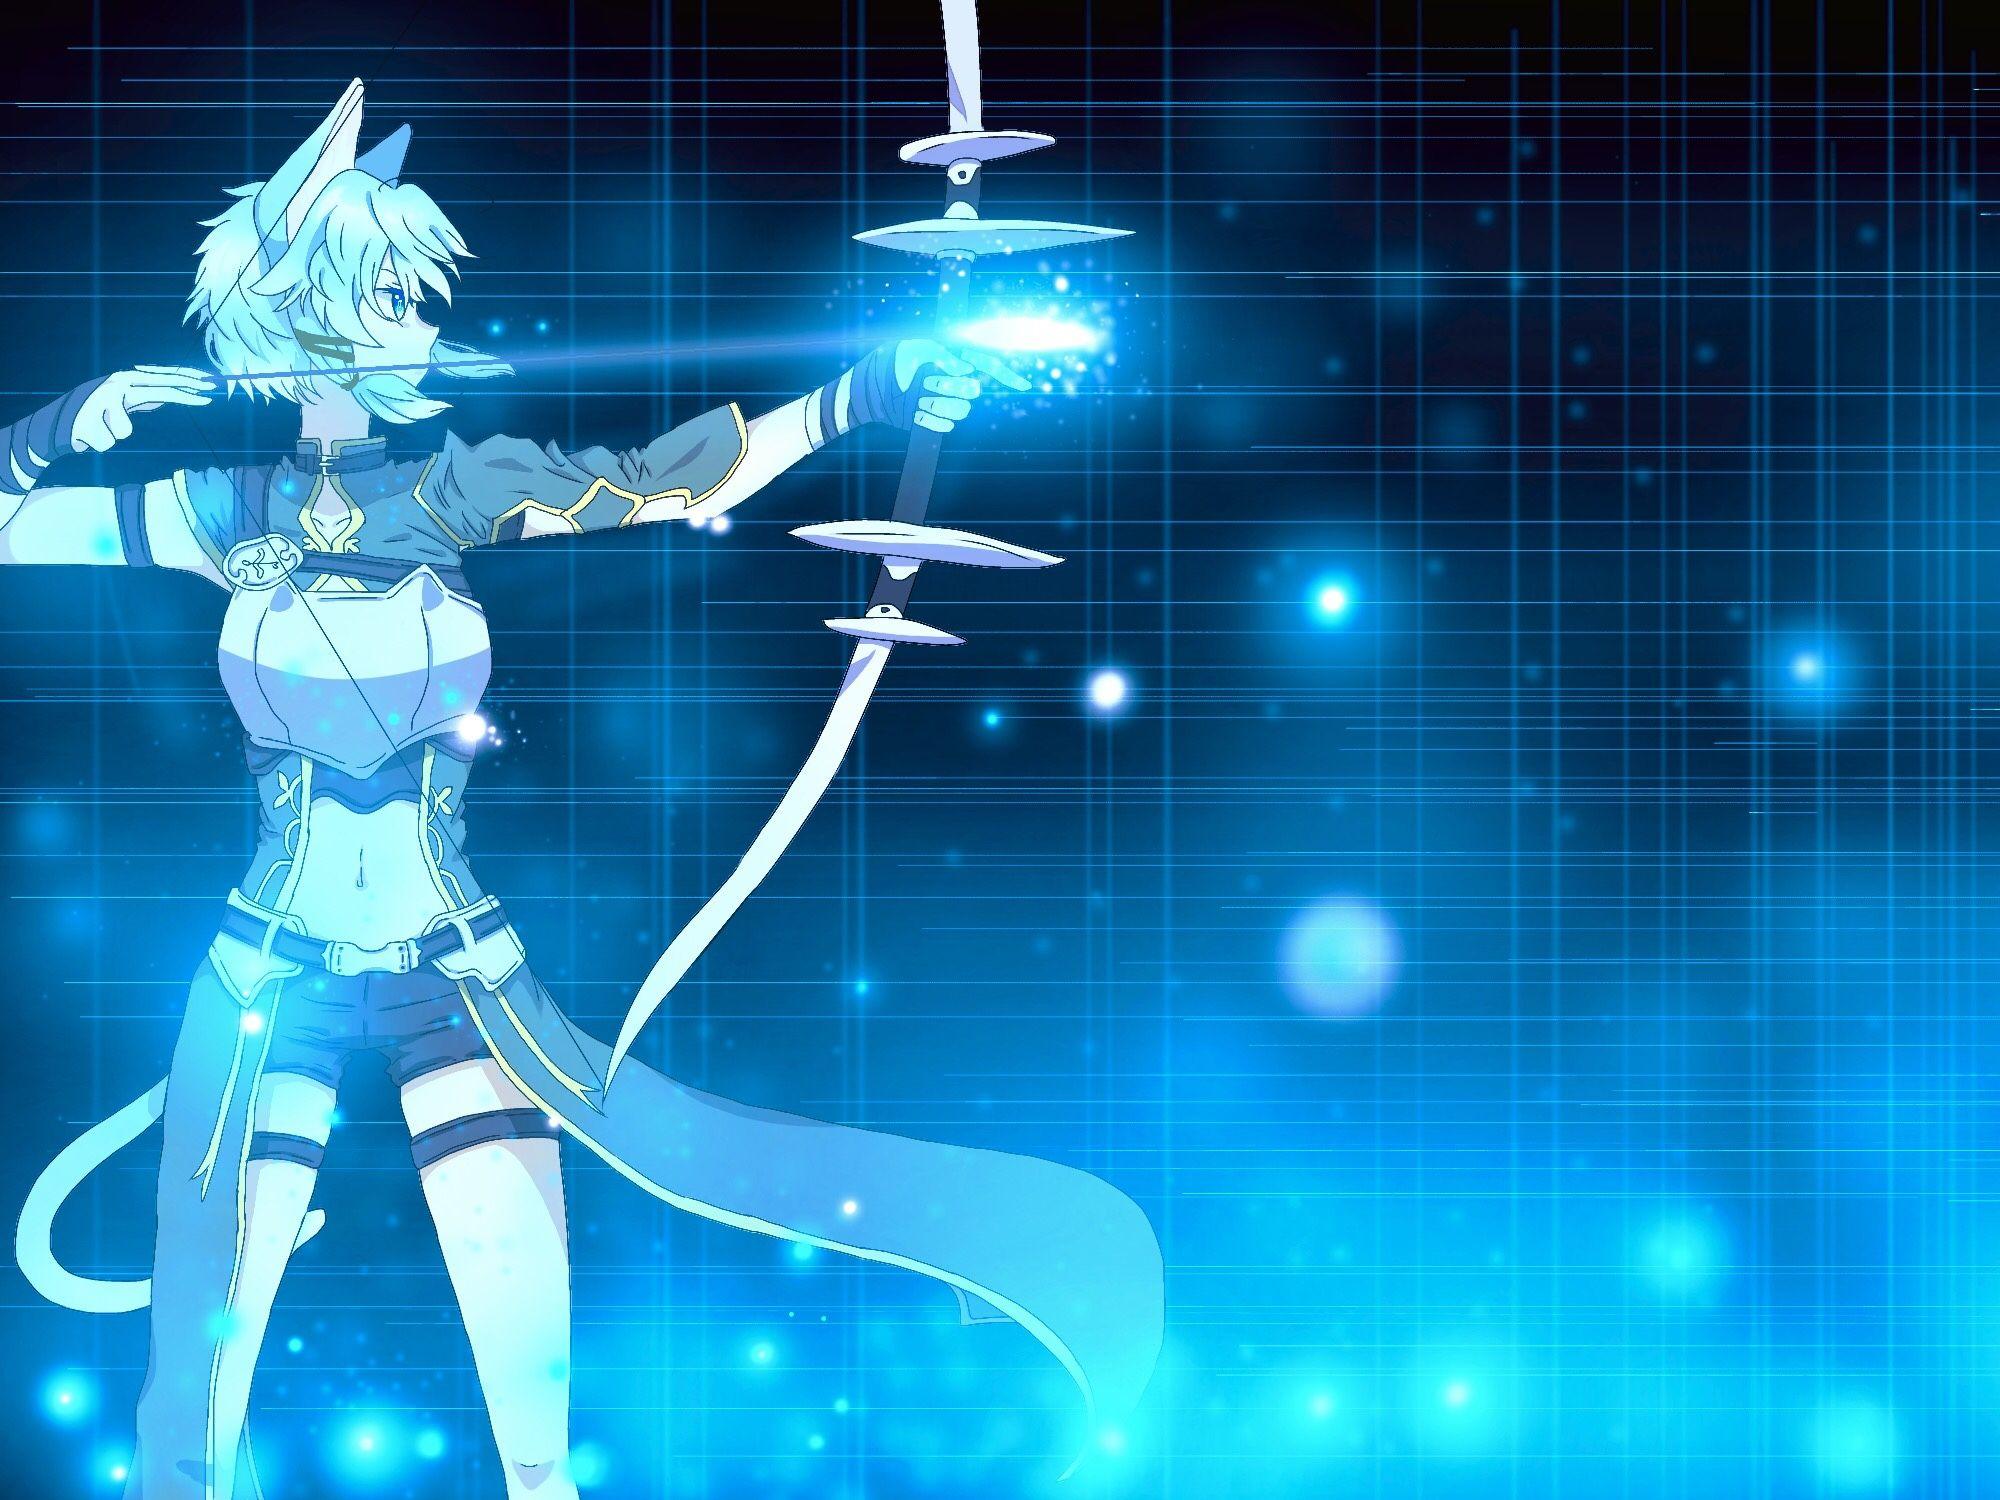 Anime Sword Art Online Ii Sinon Wallpaper